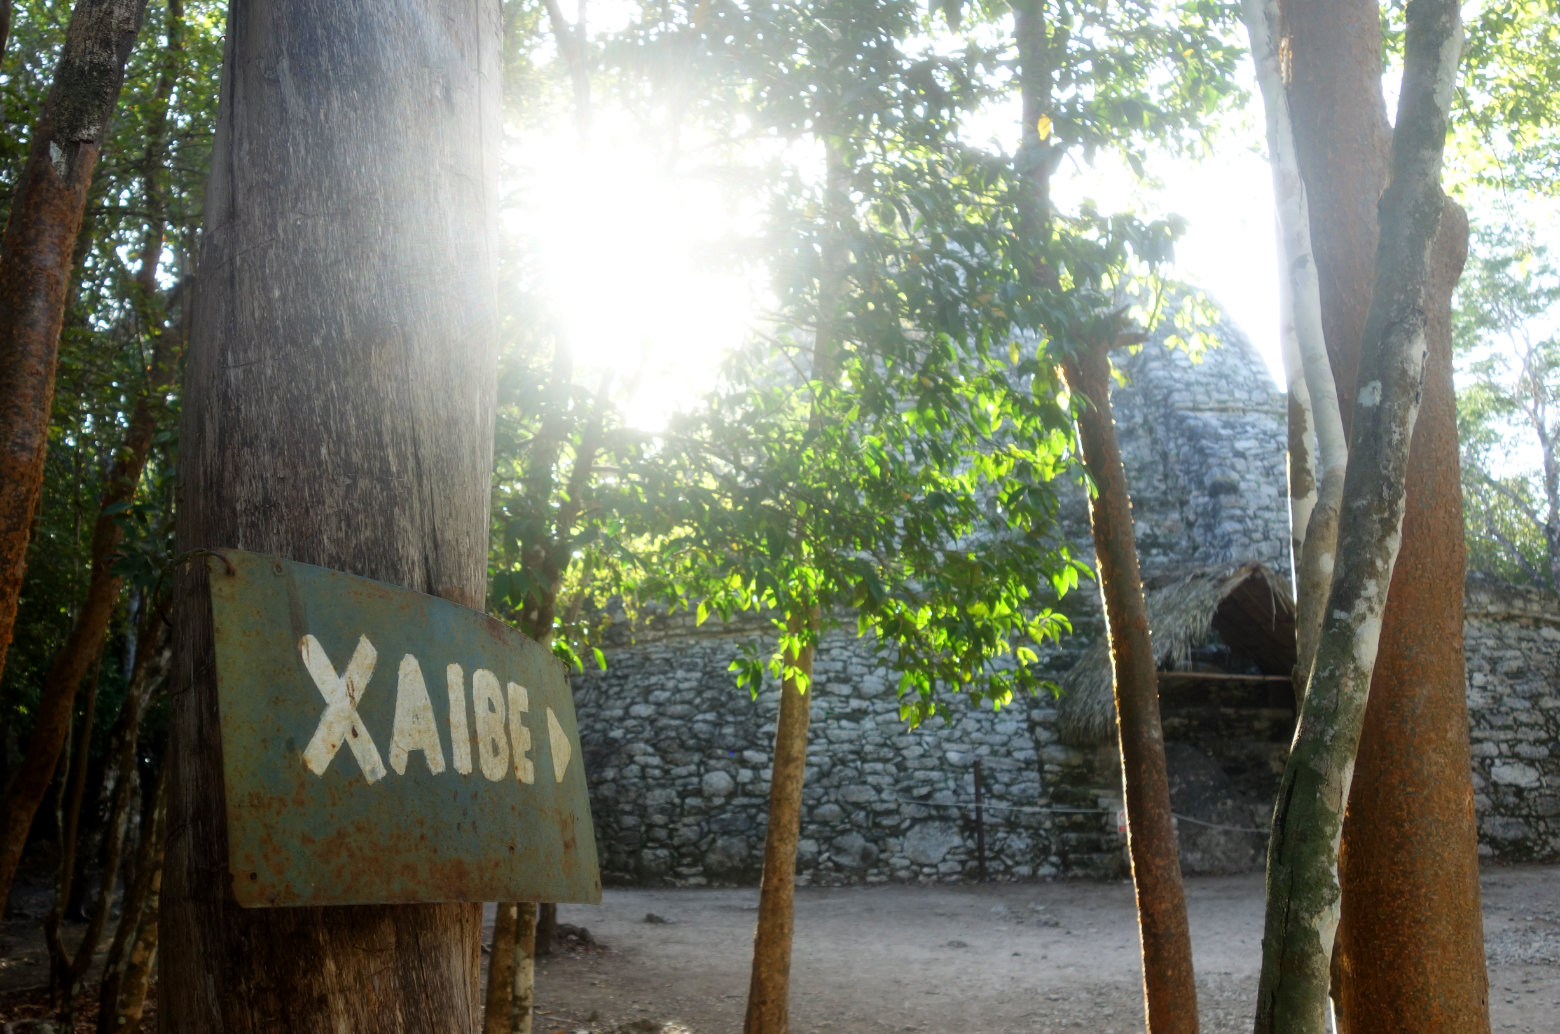 Mexiko Coba Ruine Xaibe